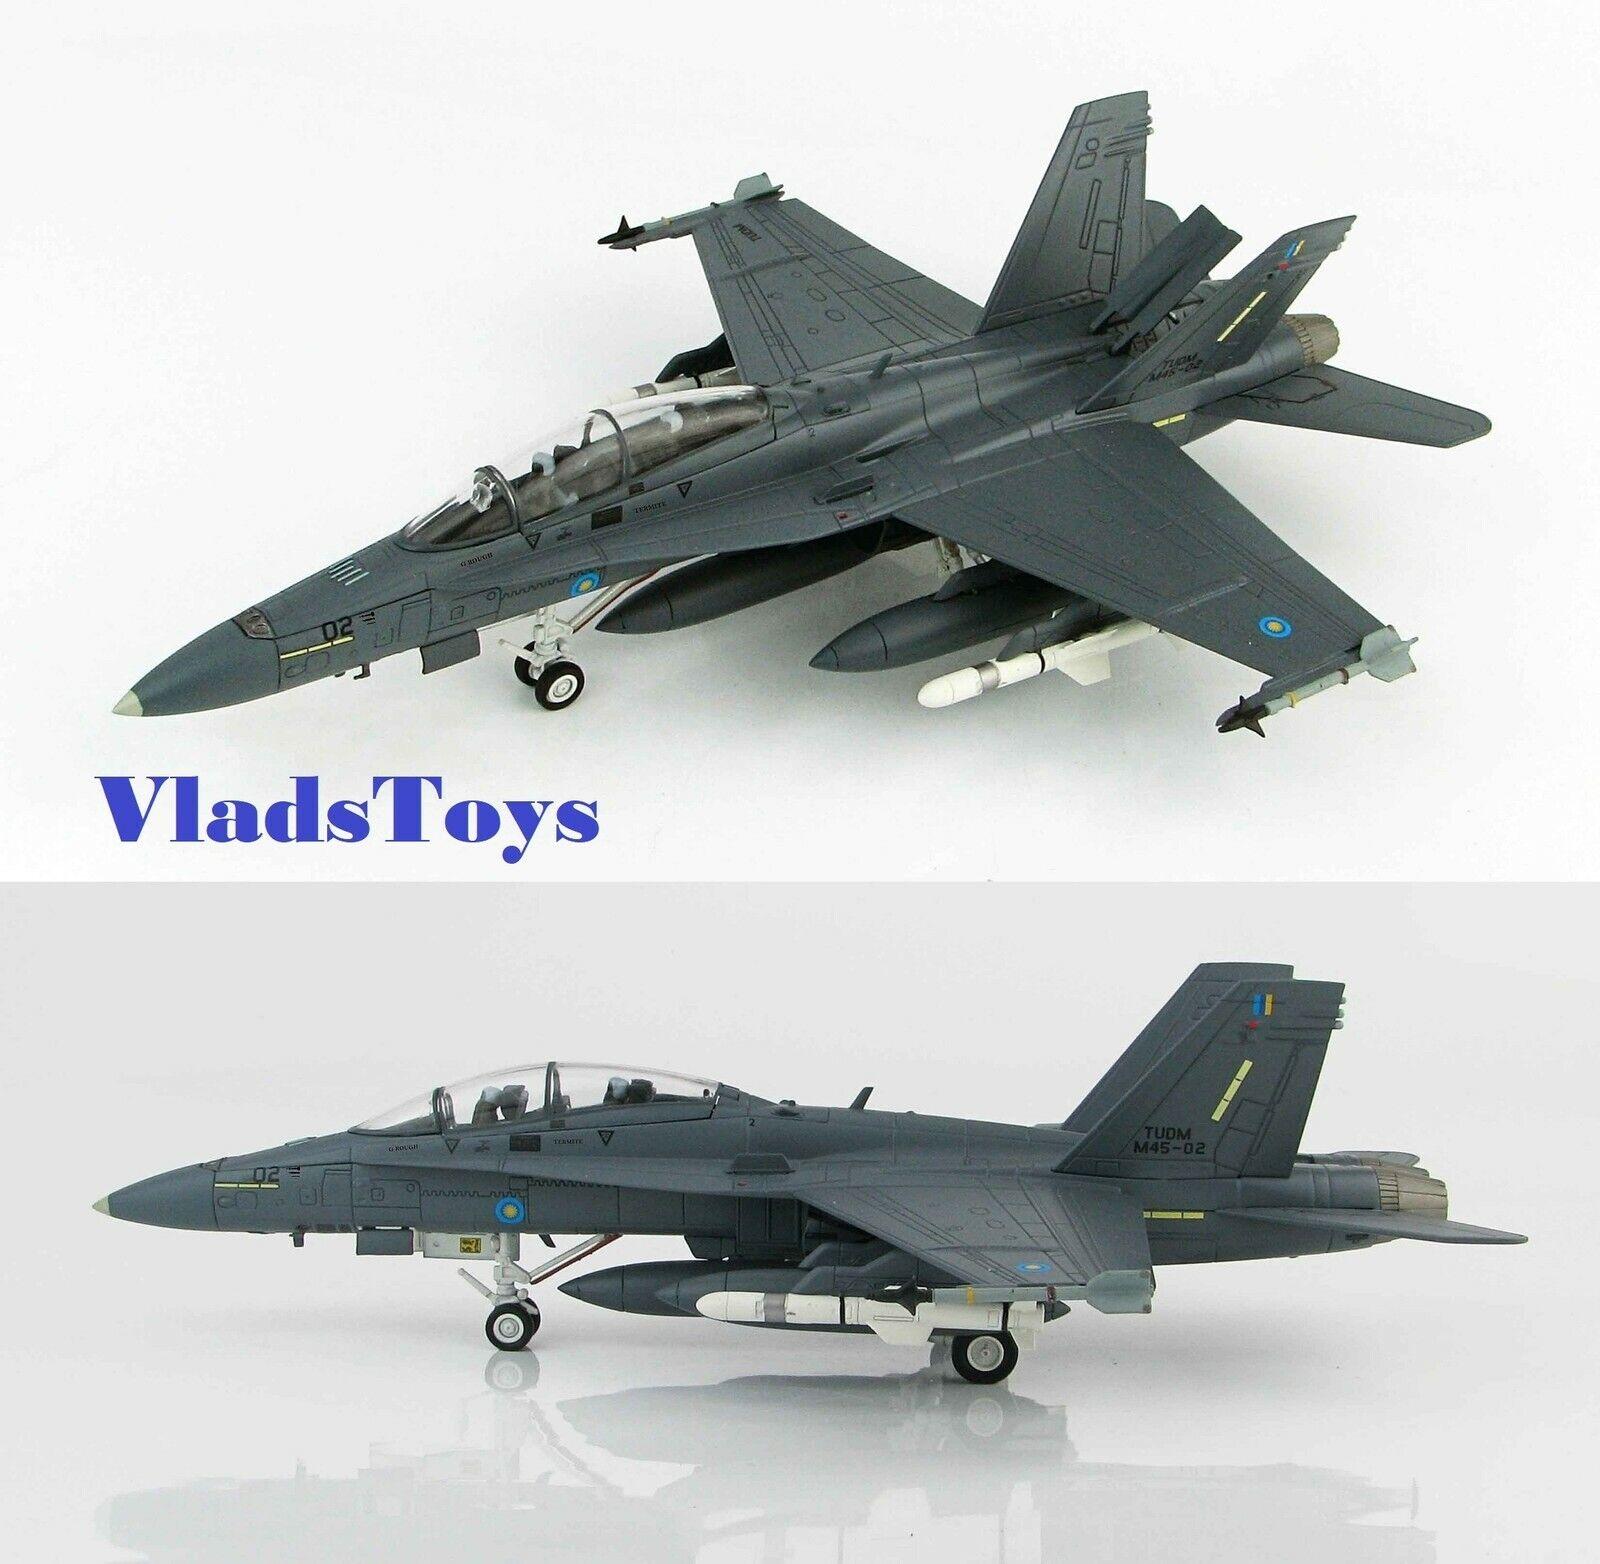 Hobby Master 1 72 F A-18D Hornet tudm M45-02 Butterworth ab Malasia 2015 HA3541